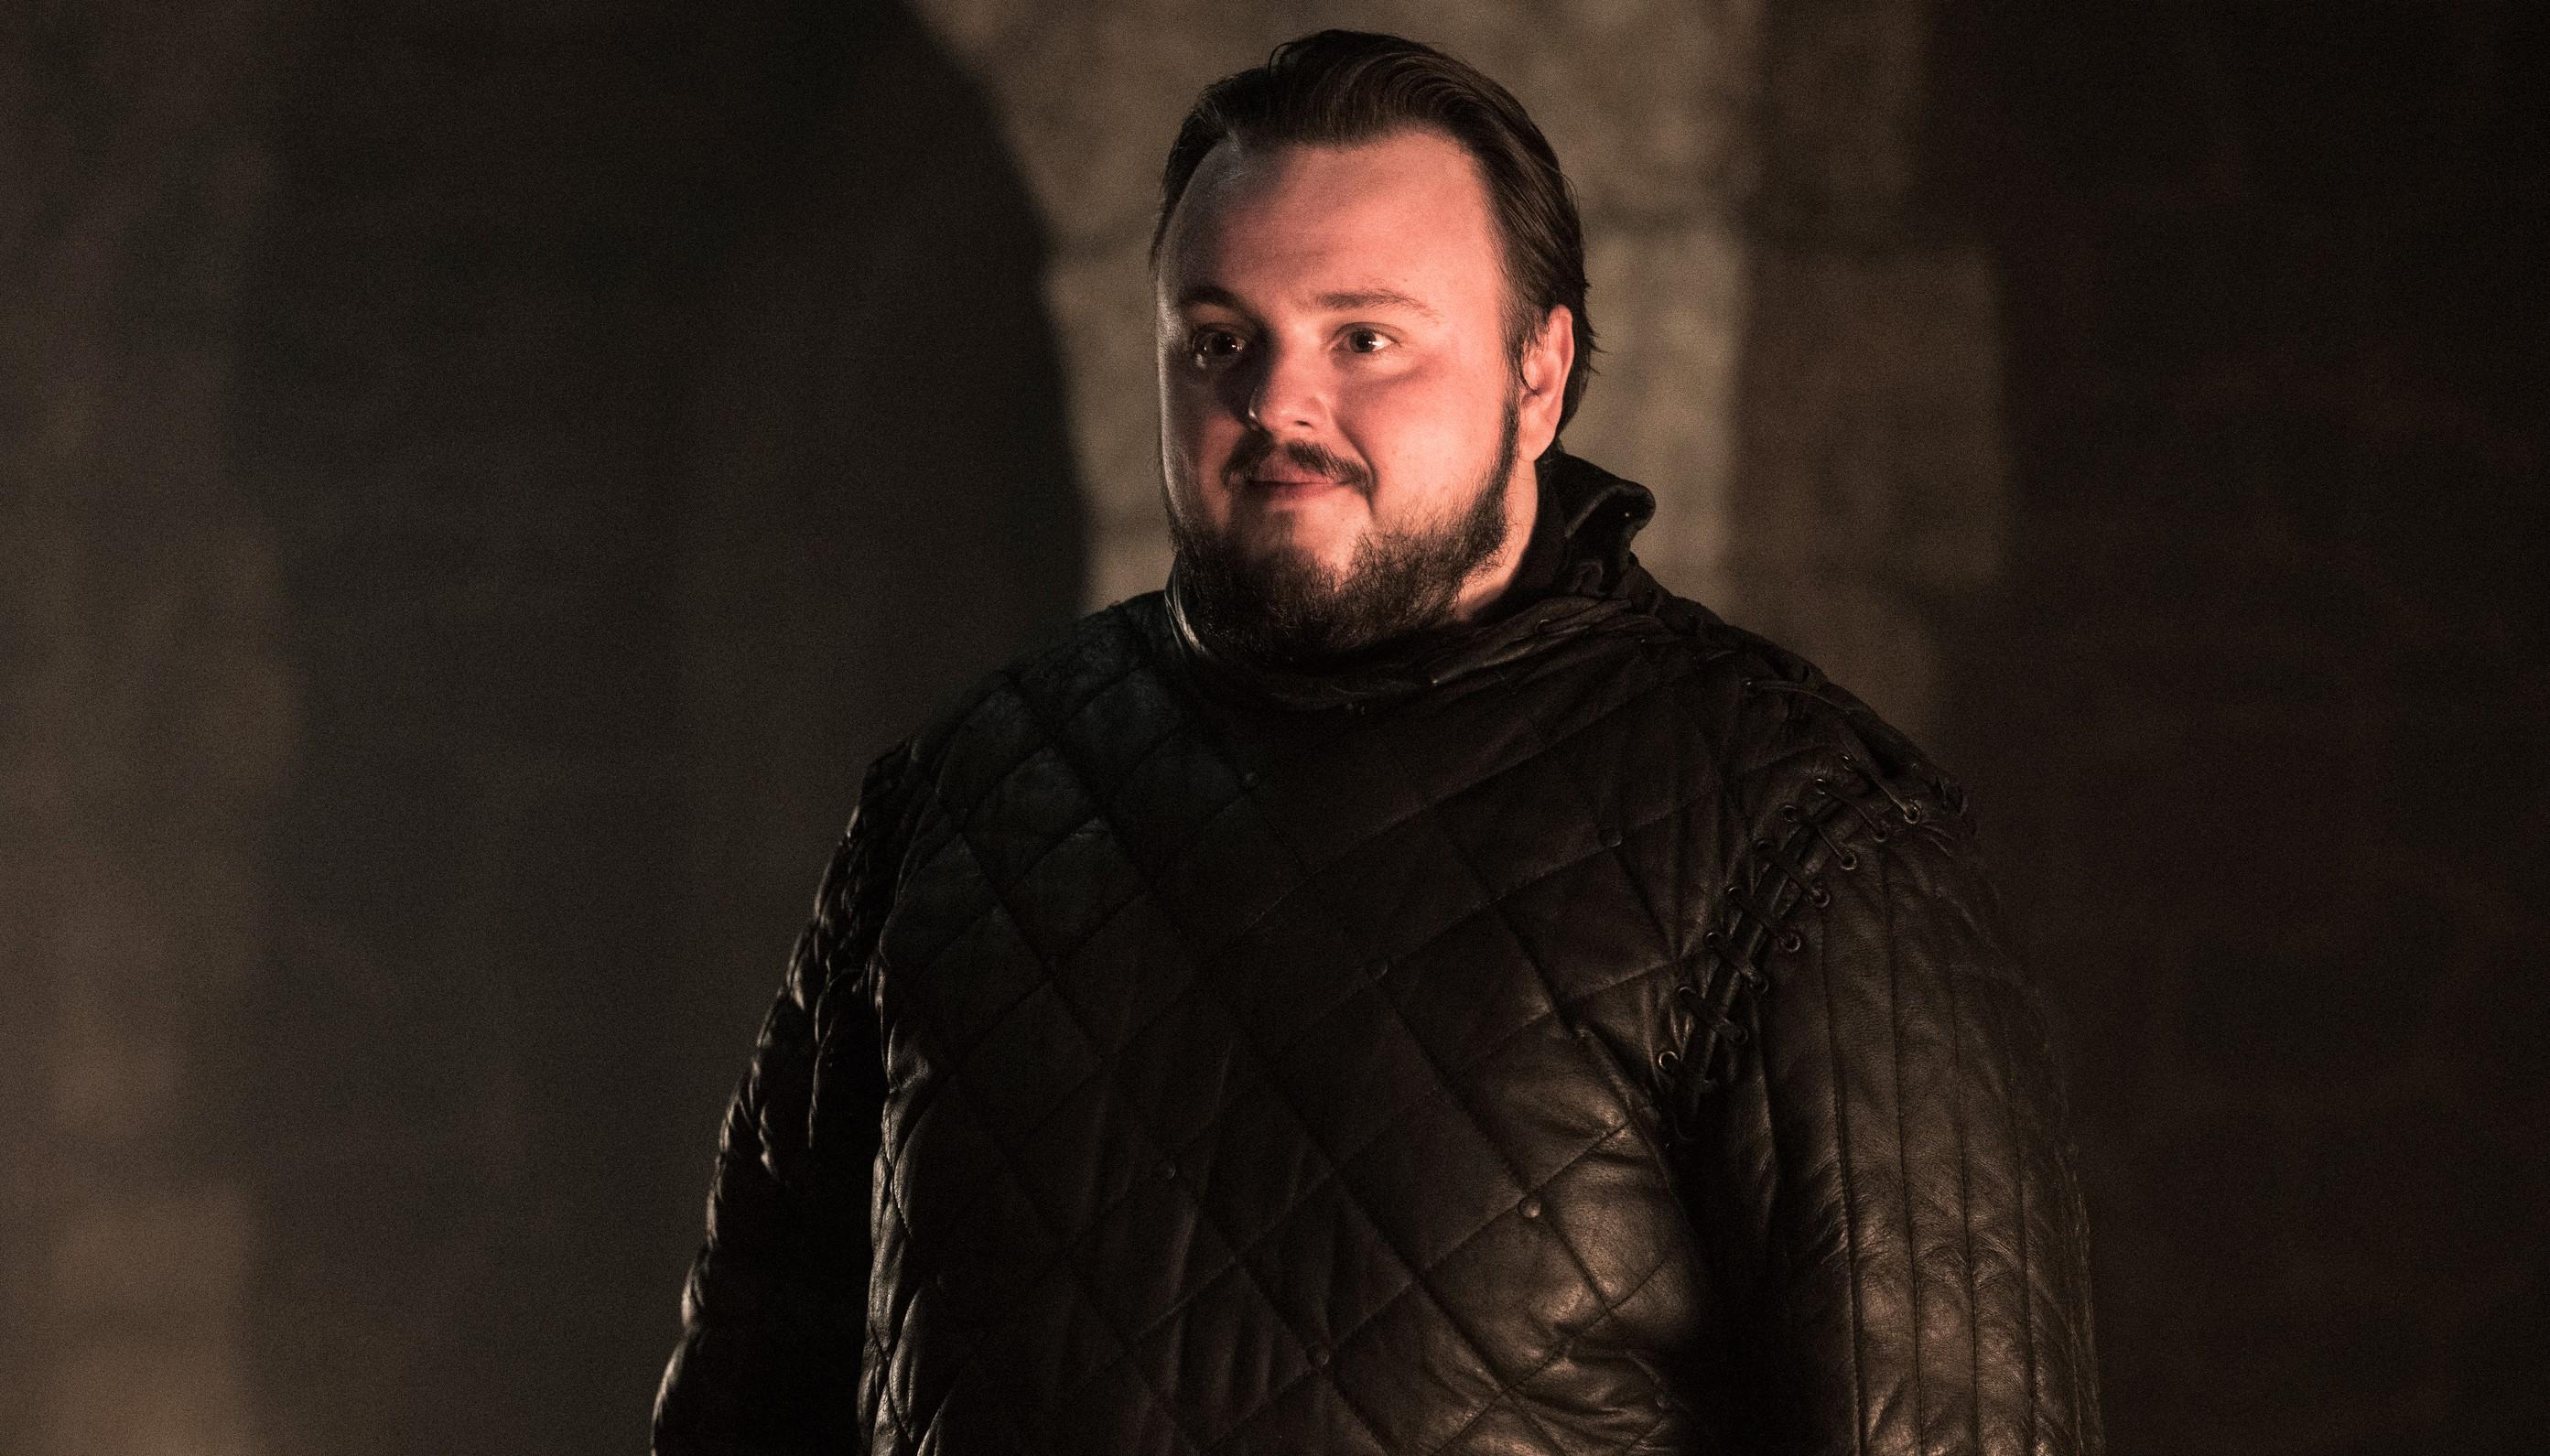 Sam Tarly, Winterfell, Season 8